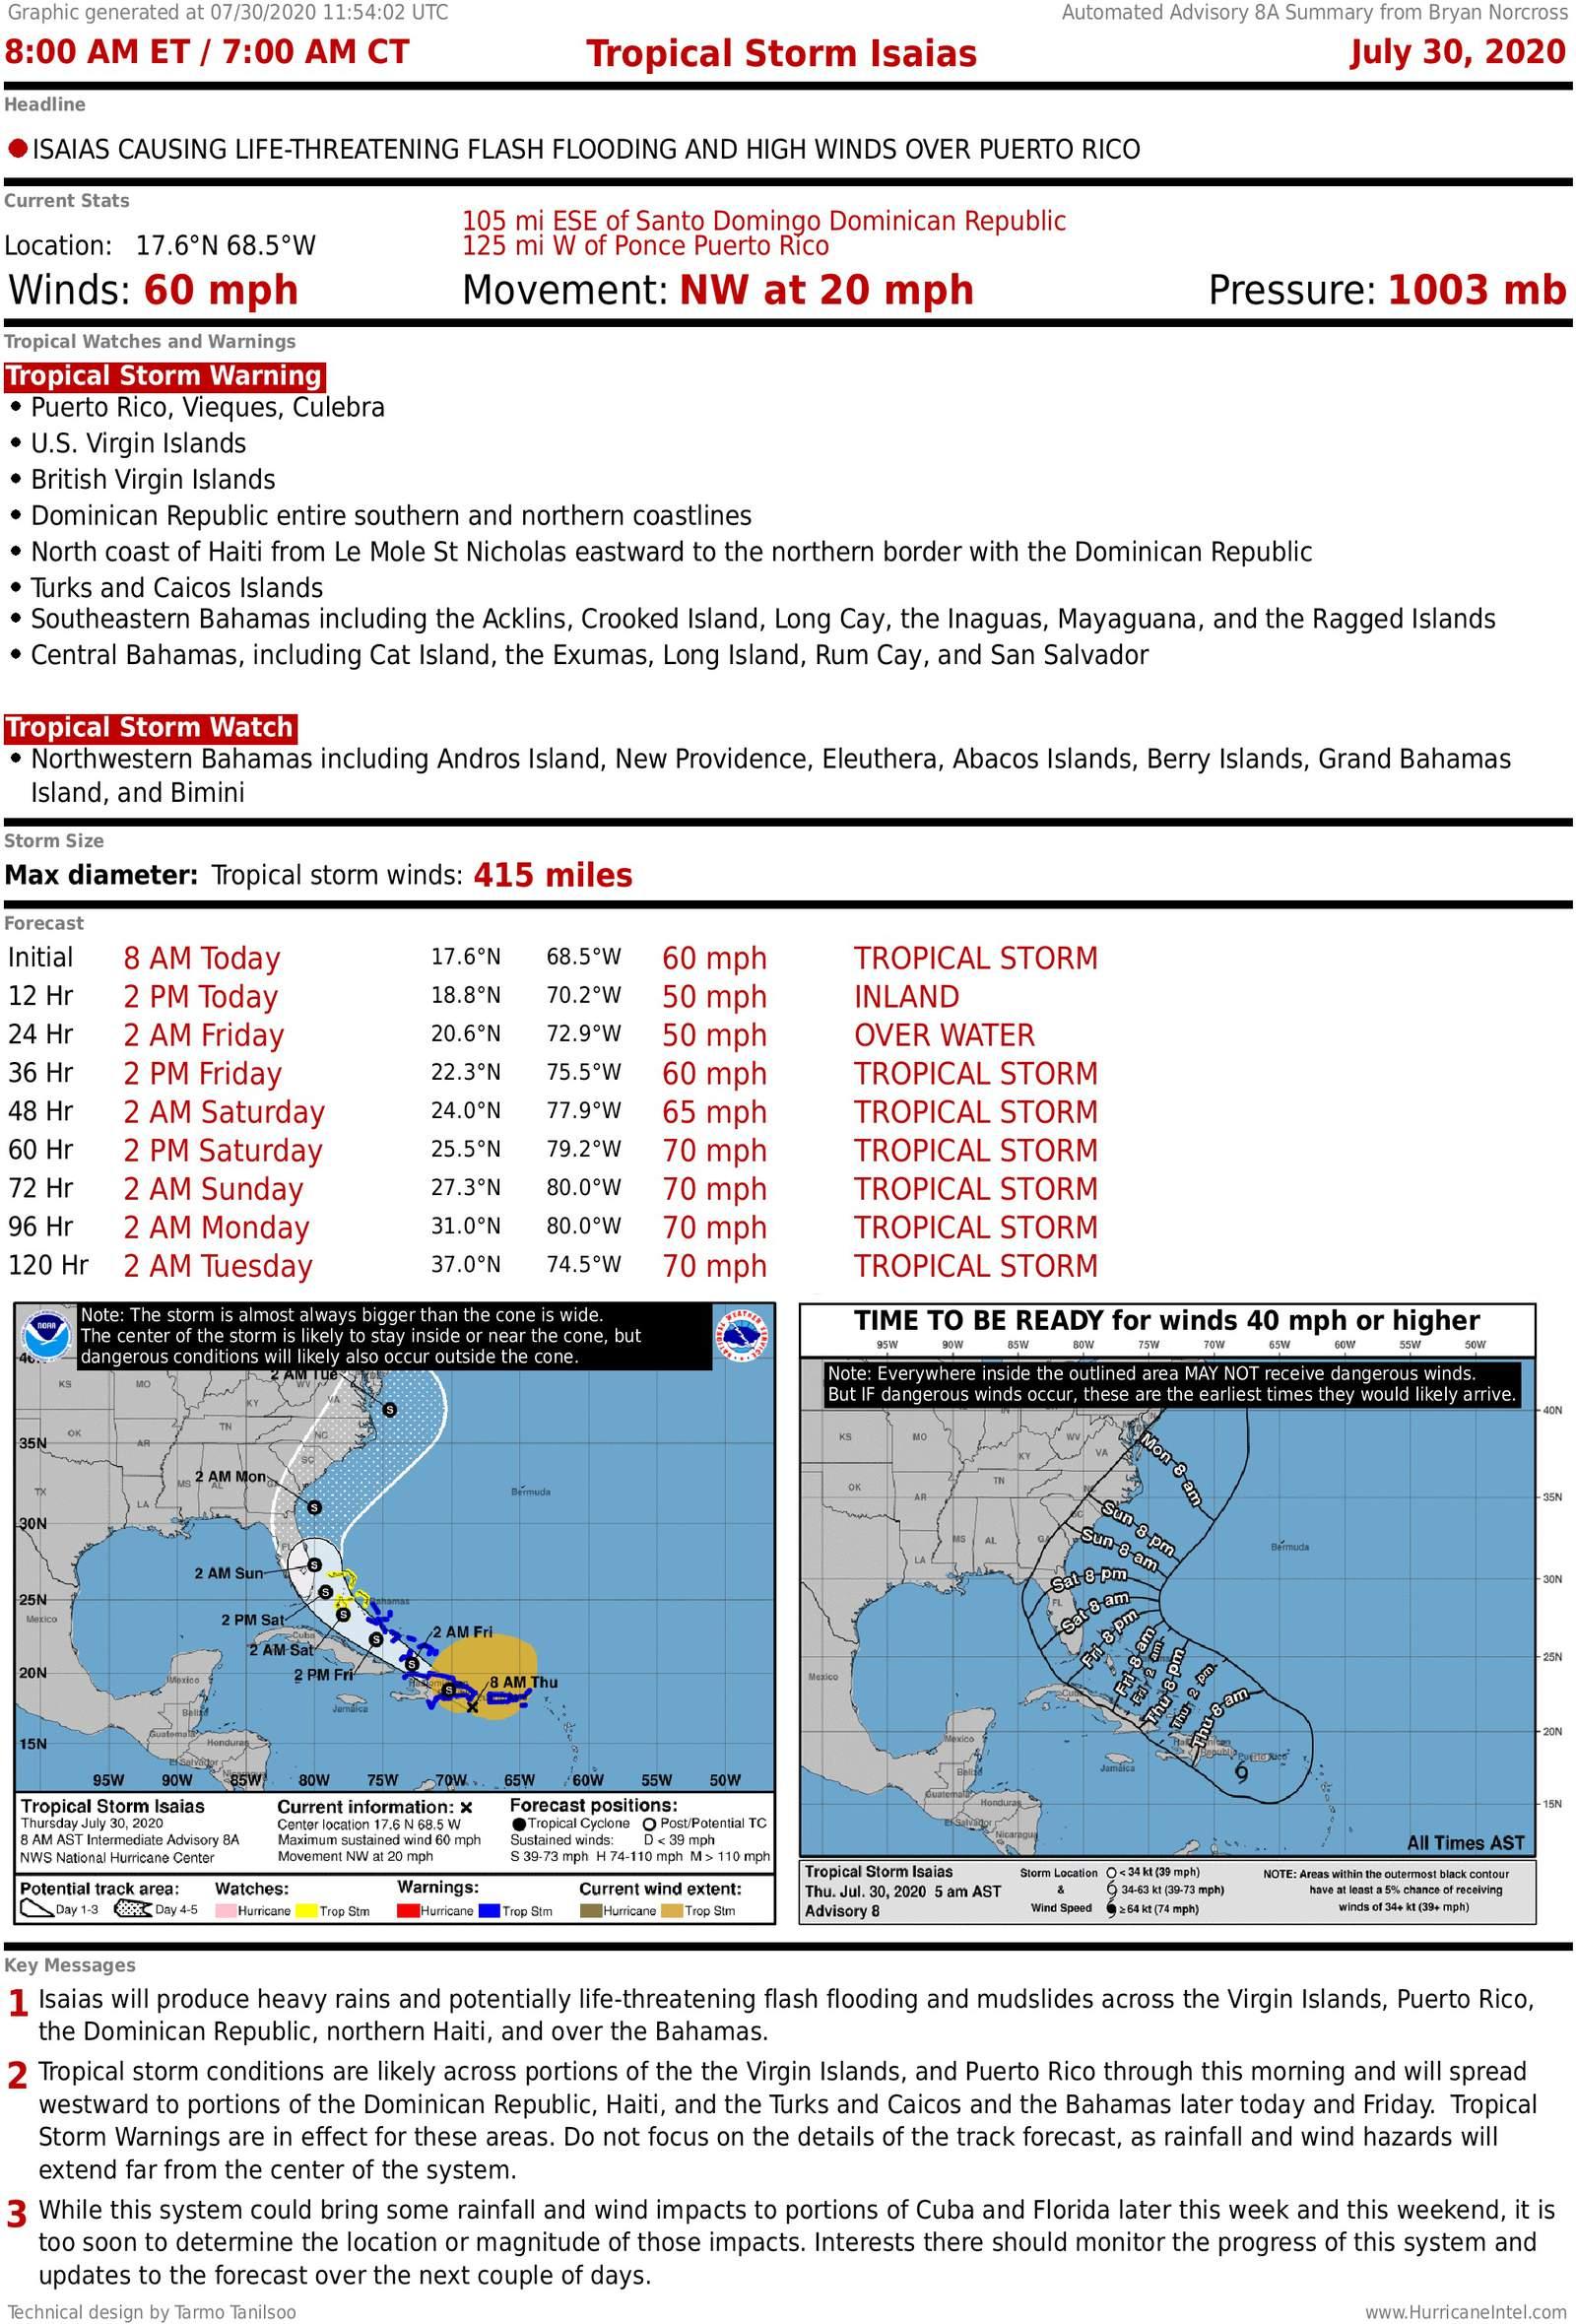 Tormenta tropical Isaias, 8 am jueves aviso.